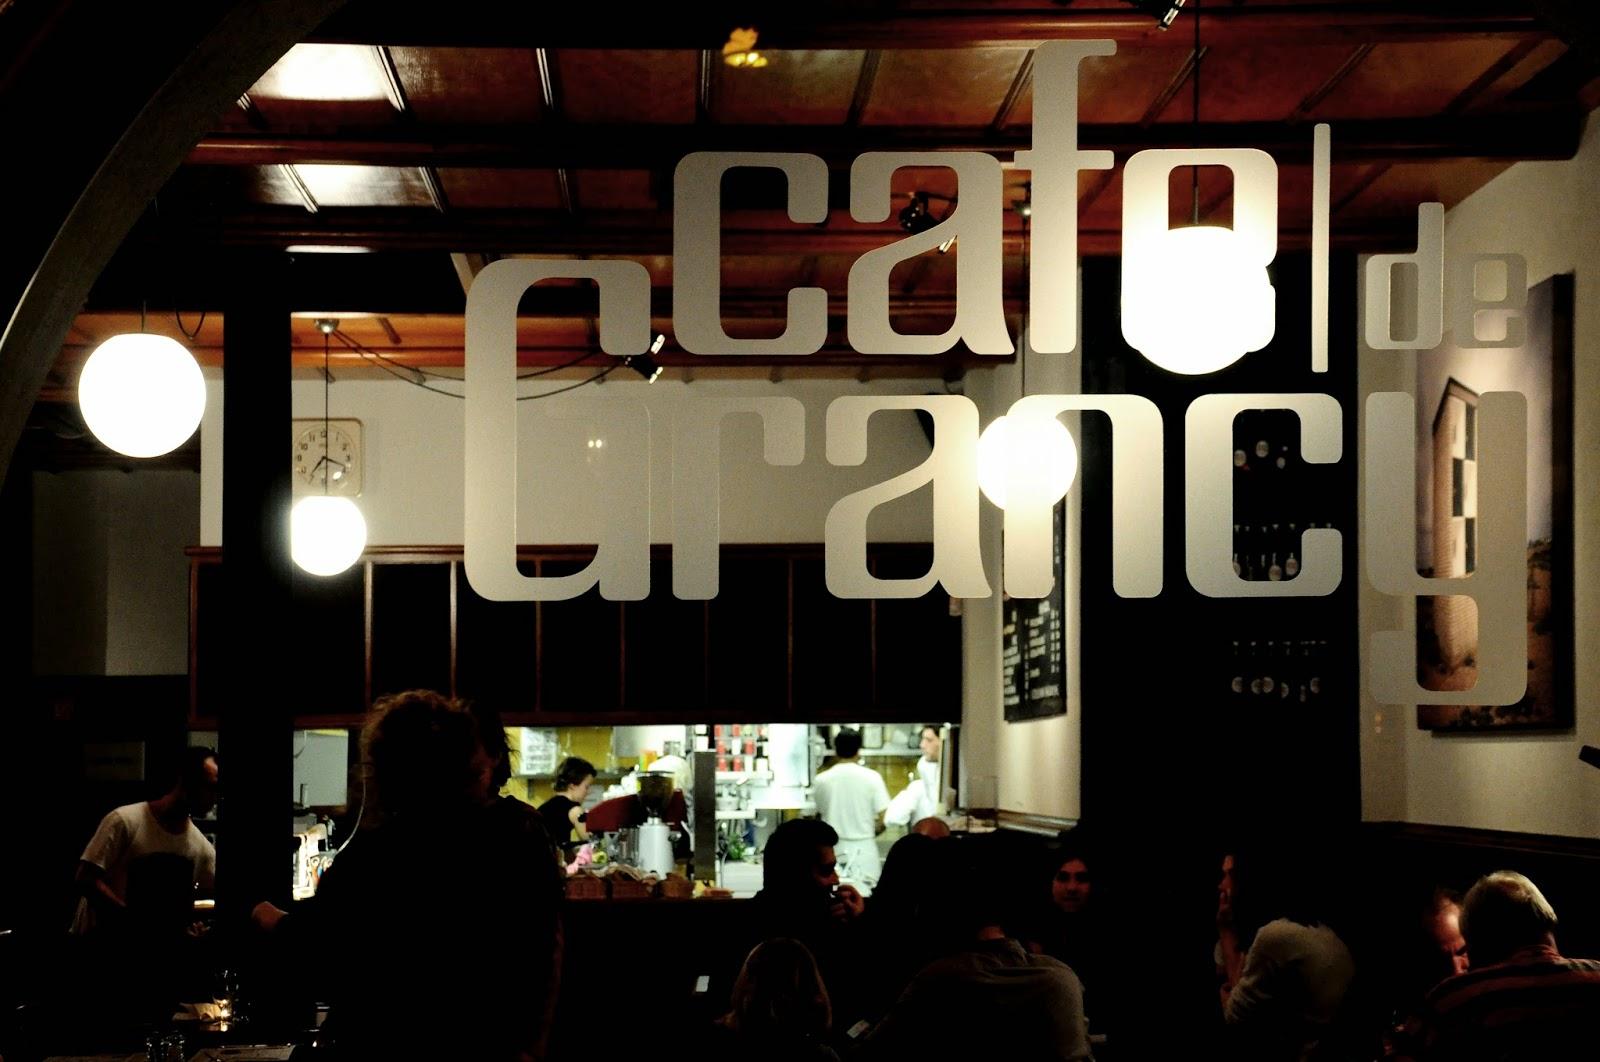 cafe de grancy reserver